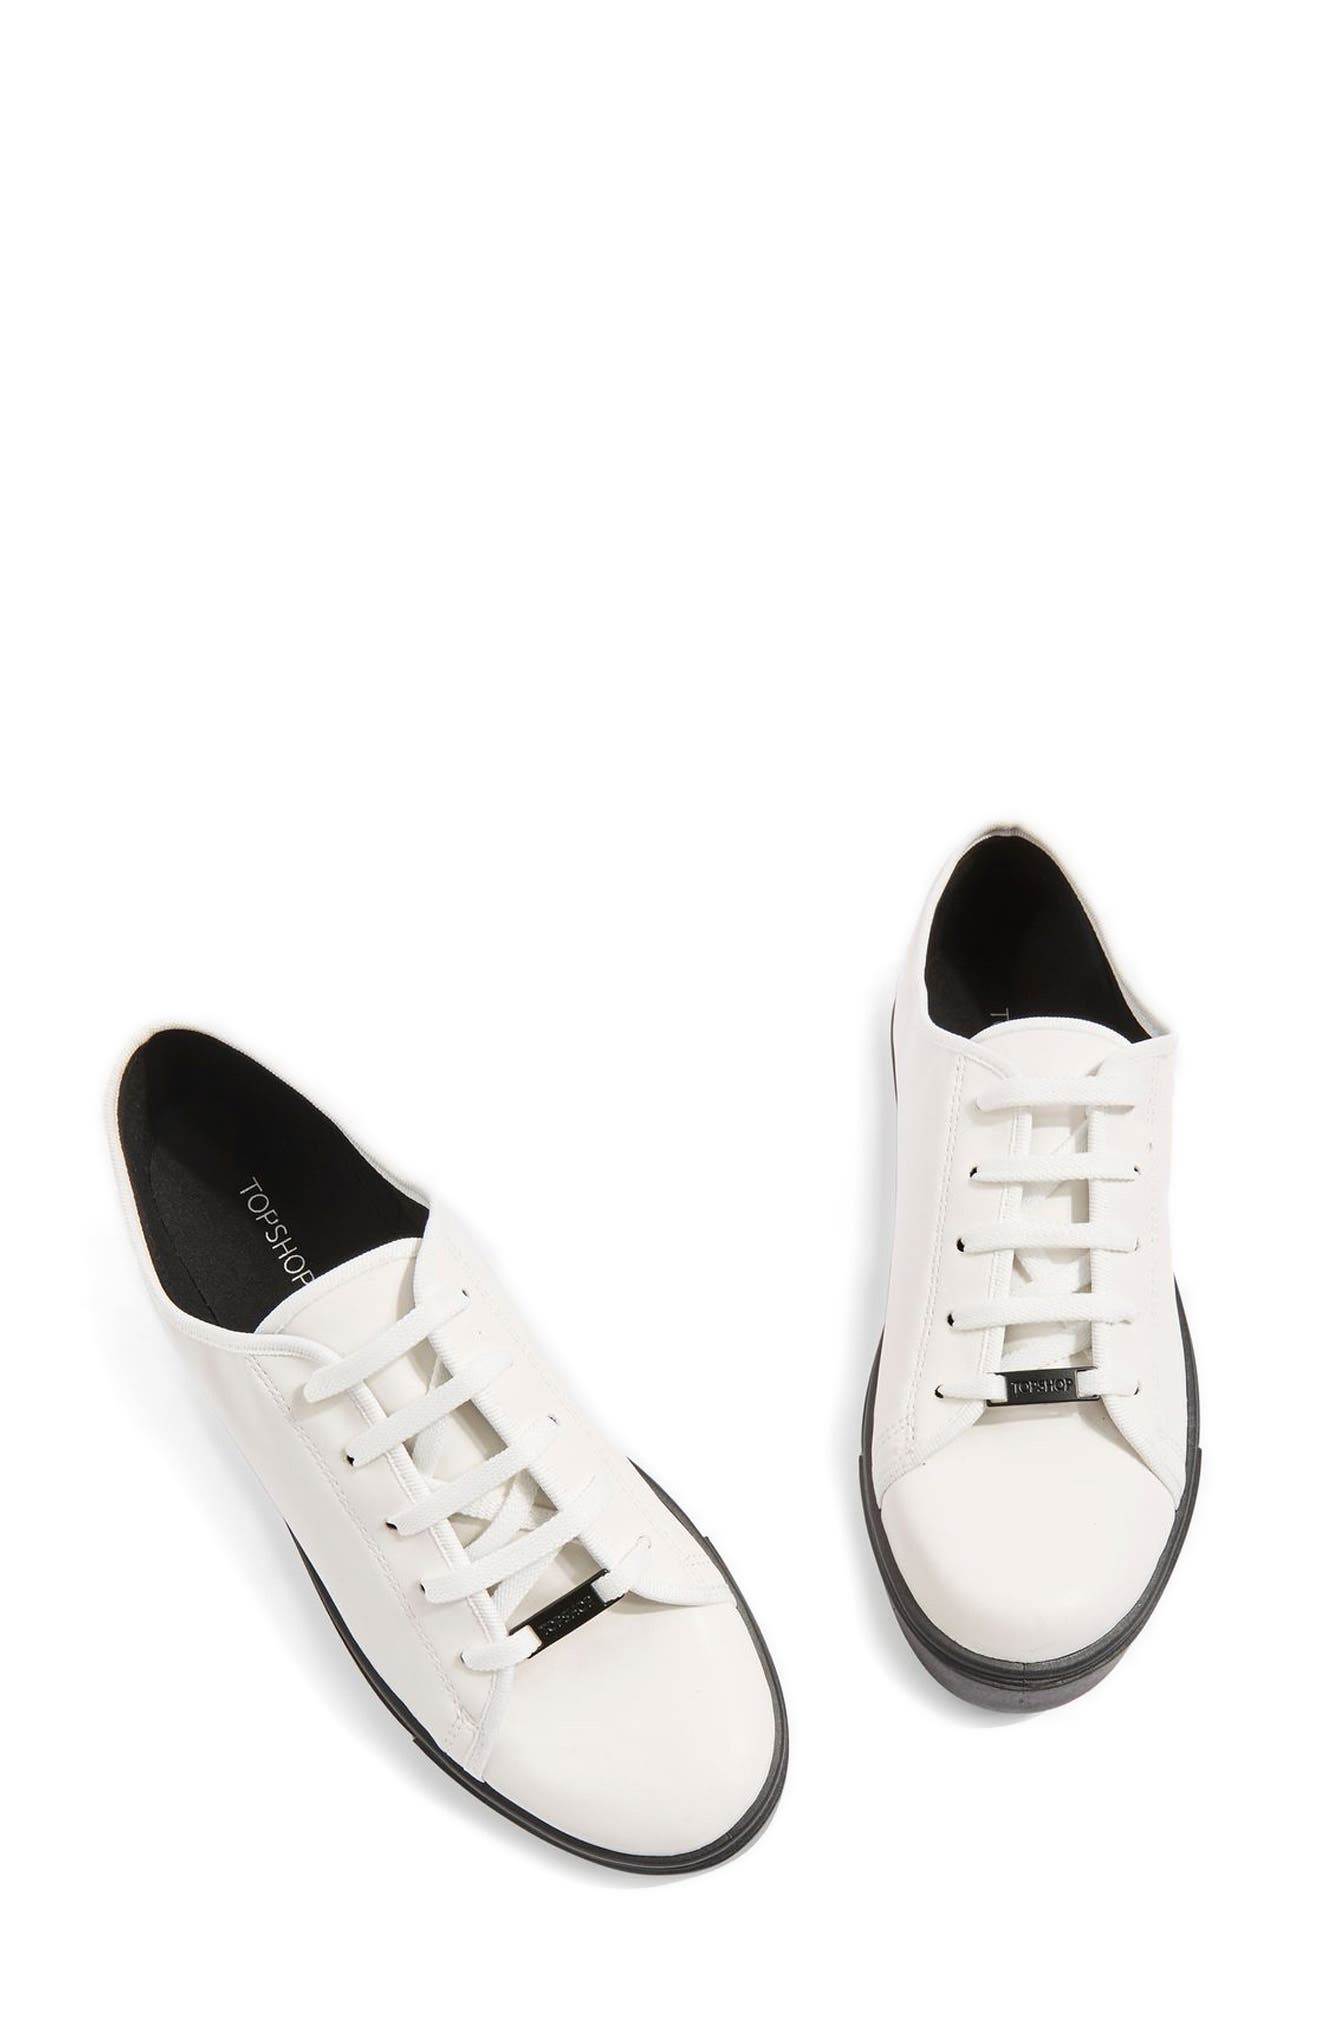 Crush Waterproof Contrast Sole Sneaker,                             Main thumbnail 1, color,                             Black Multi